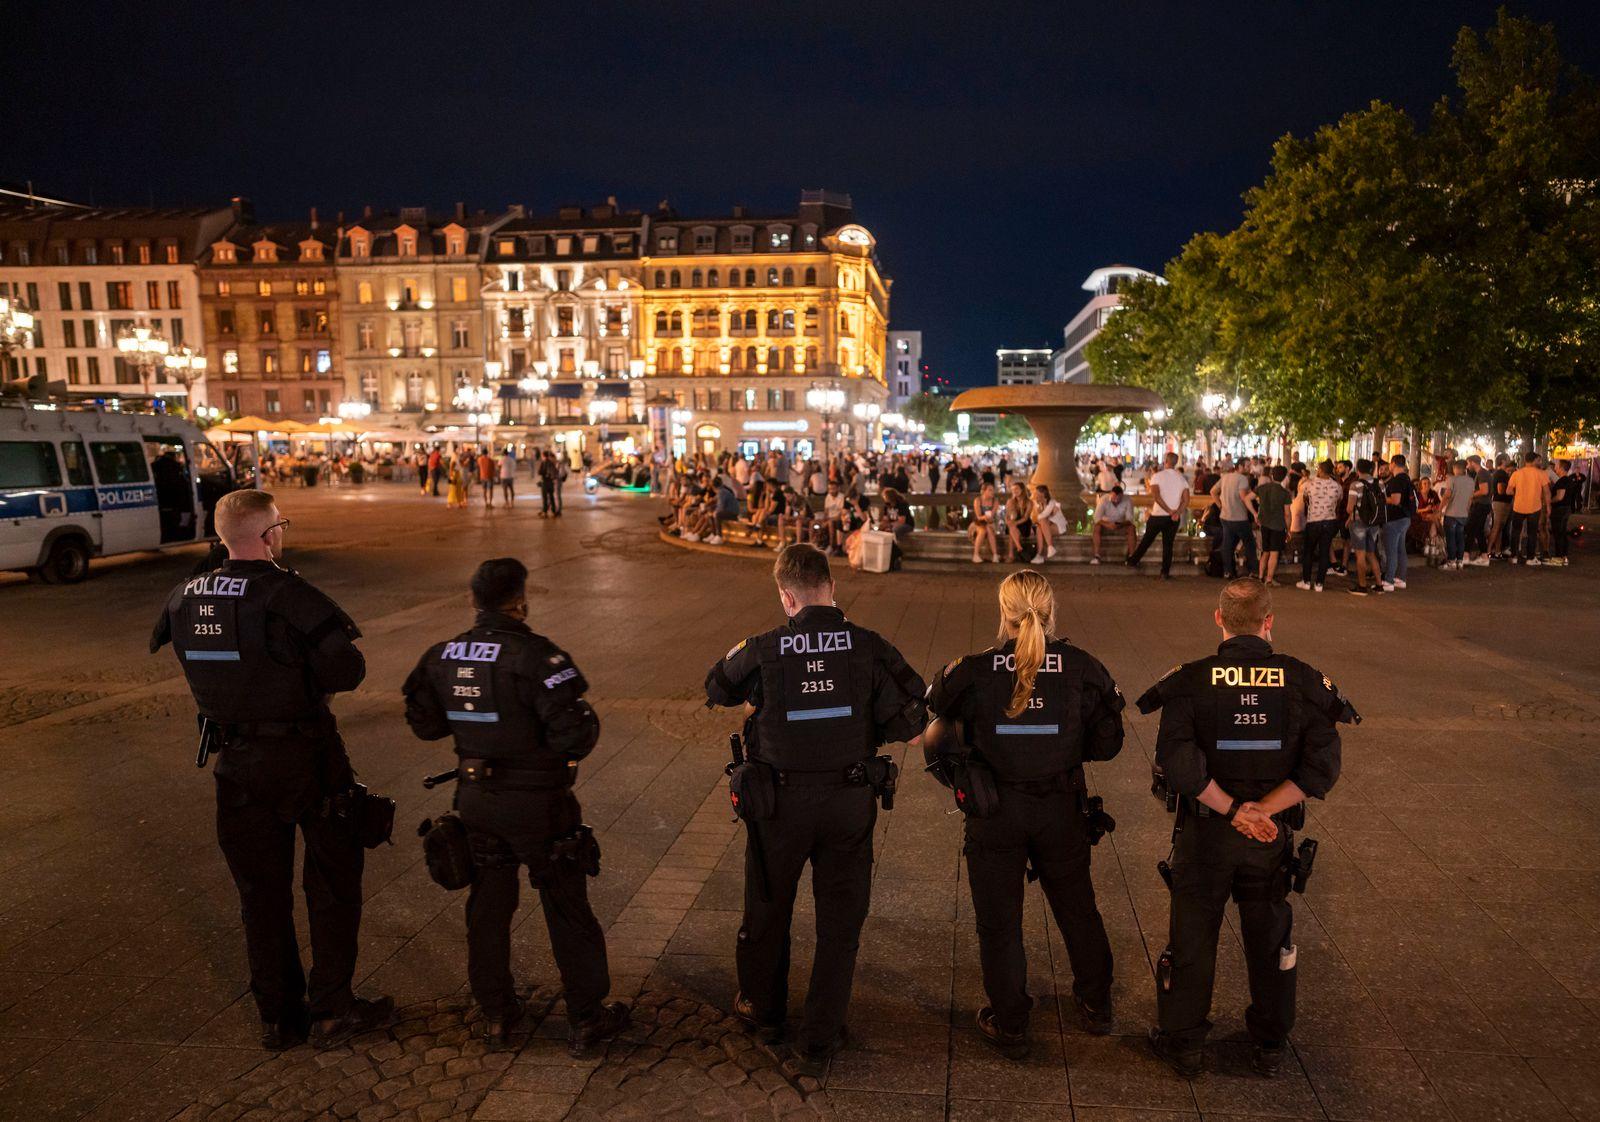 Frankfurter Opernplatz